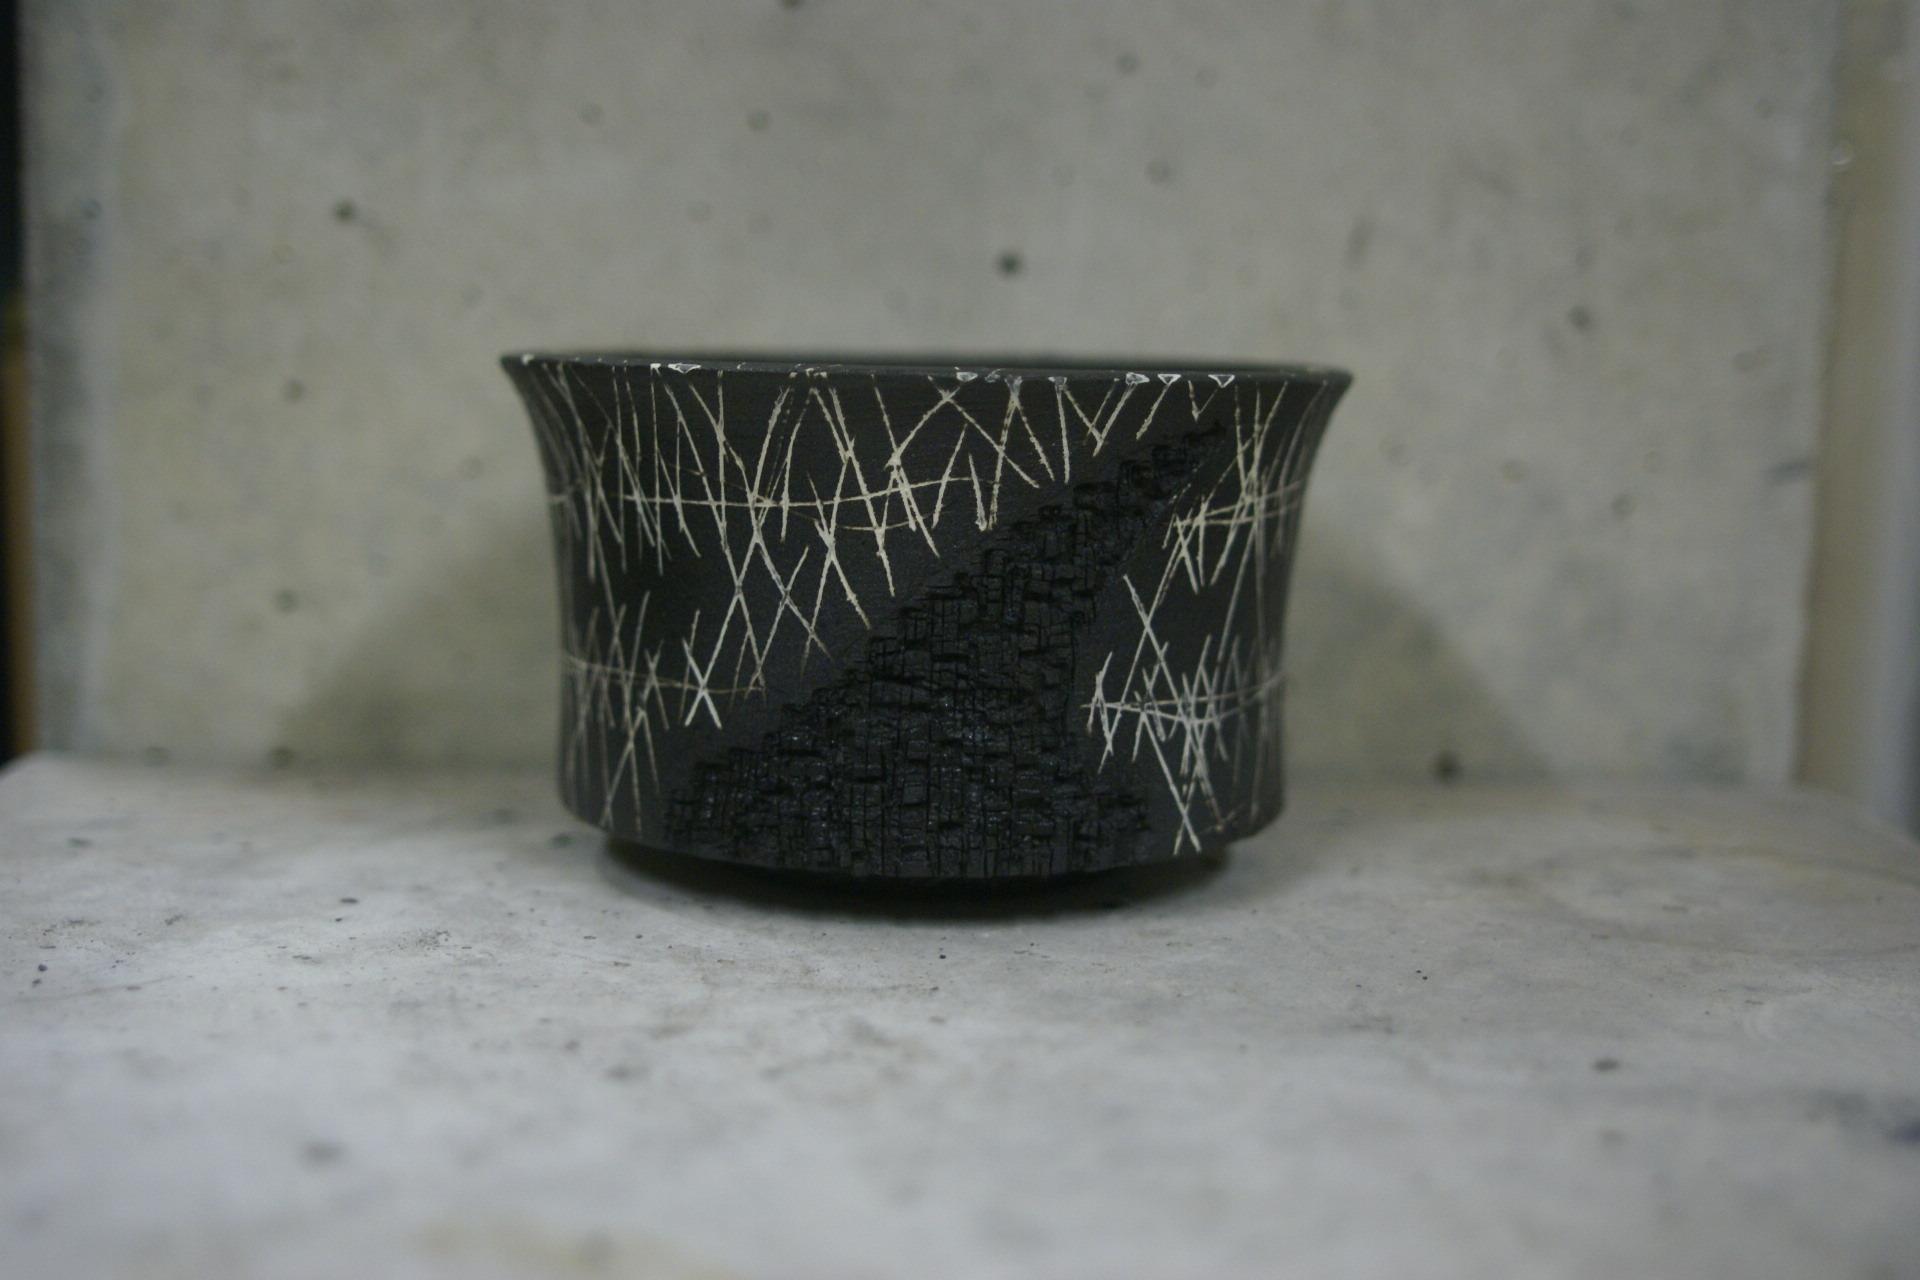 KAMAKAZE BLACK 02